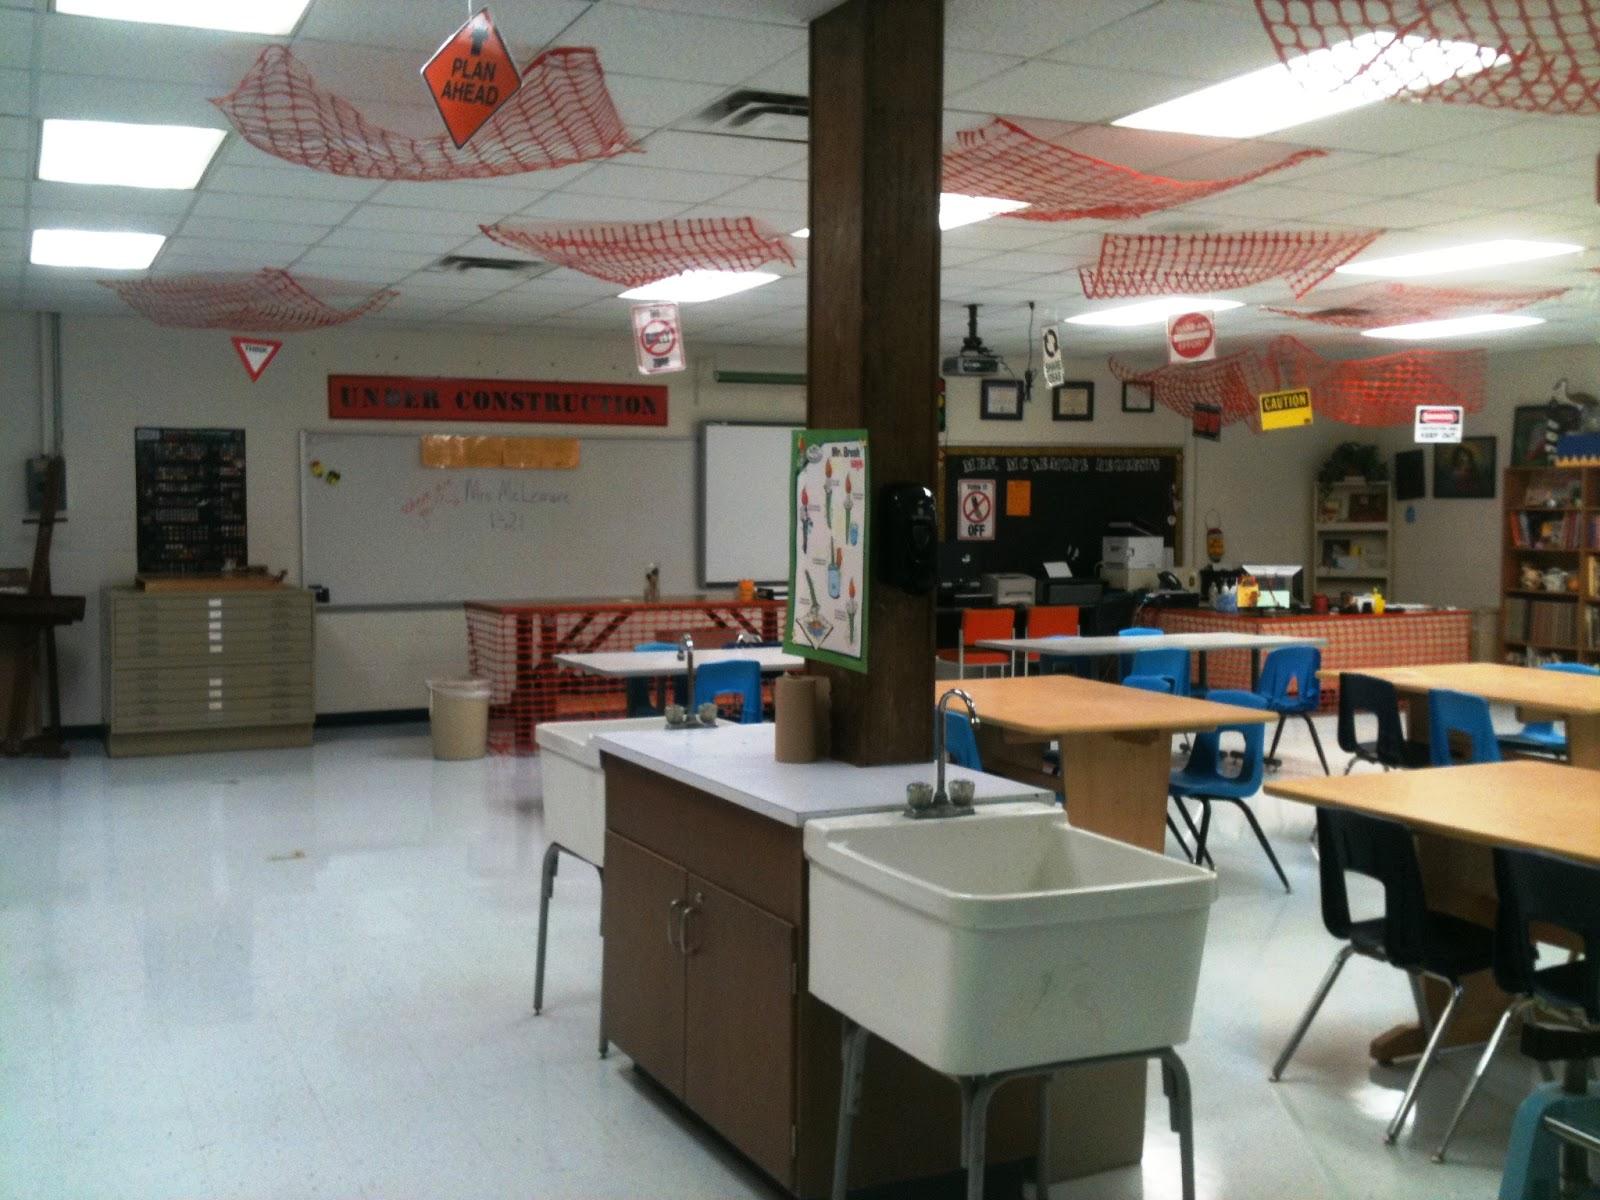 High school classroom decorating ideas high school classroom